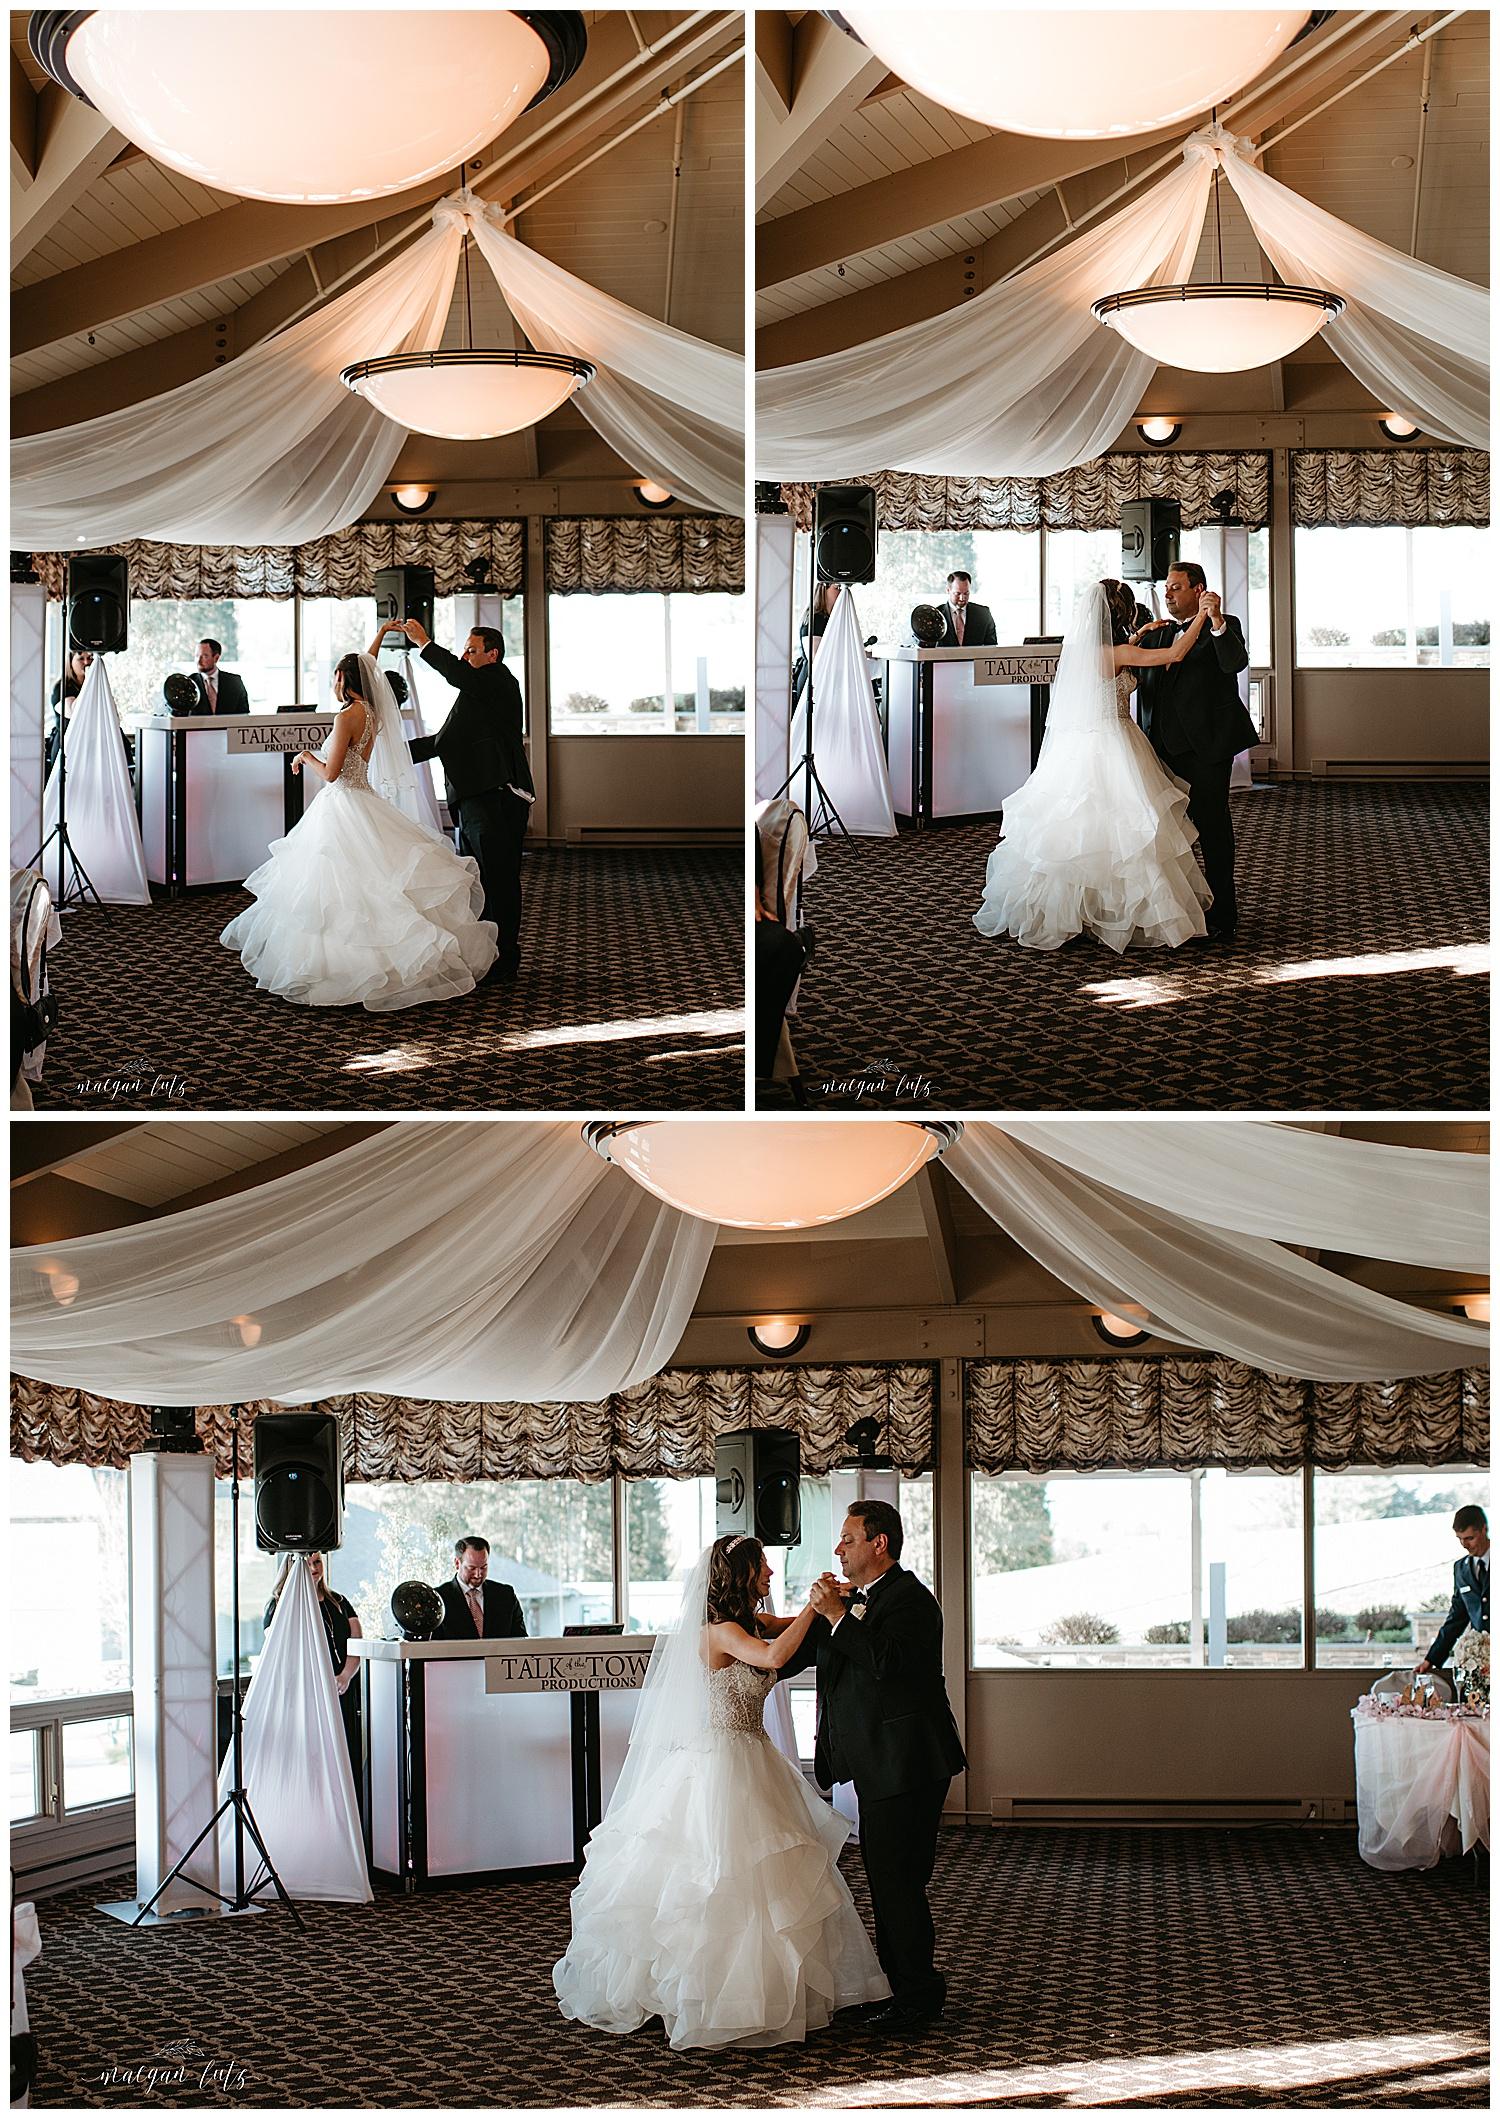 NEPA-Lehigh-Valley-Wedding-Photographer-at-Glen-Oak-Country-Club-Clarks-Summit-PA_0055.jpg